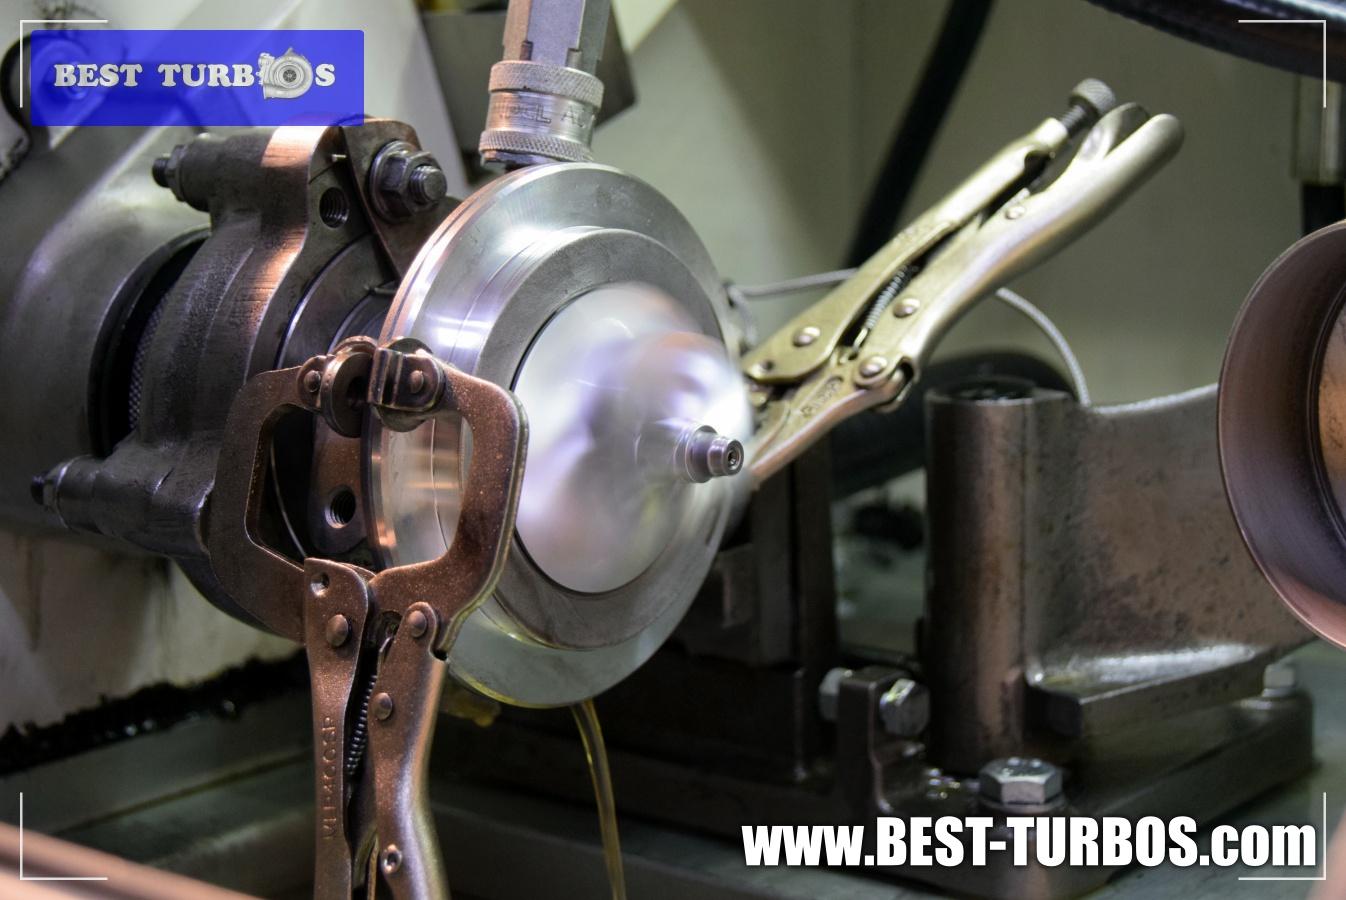 Workshop gallery | BMW, Land Rover, Range Rover turbo repairs